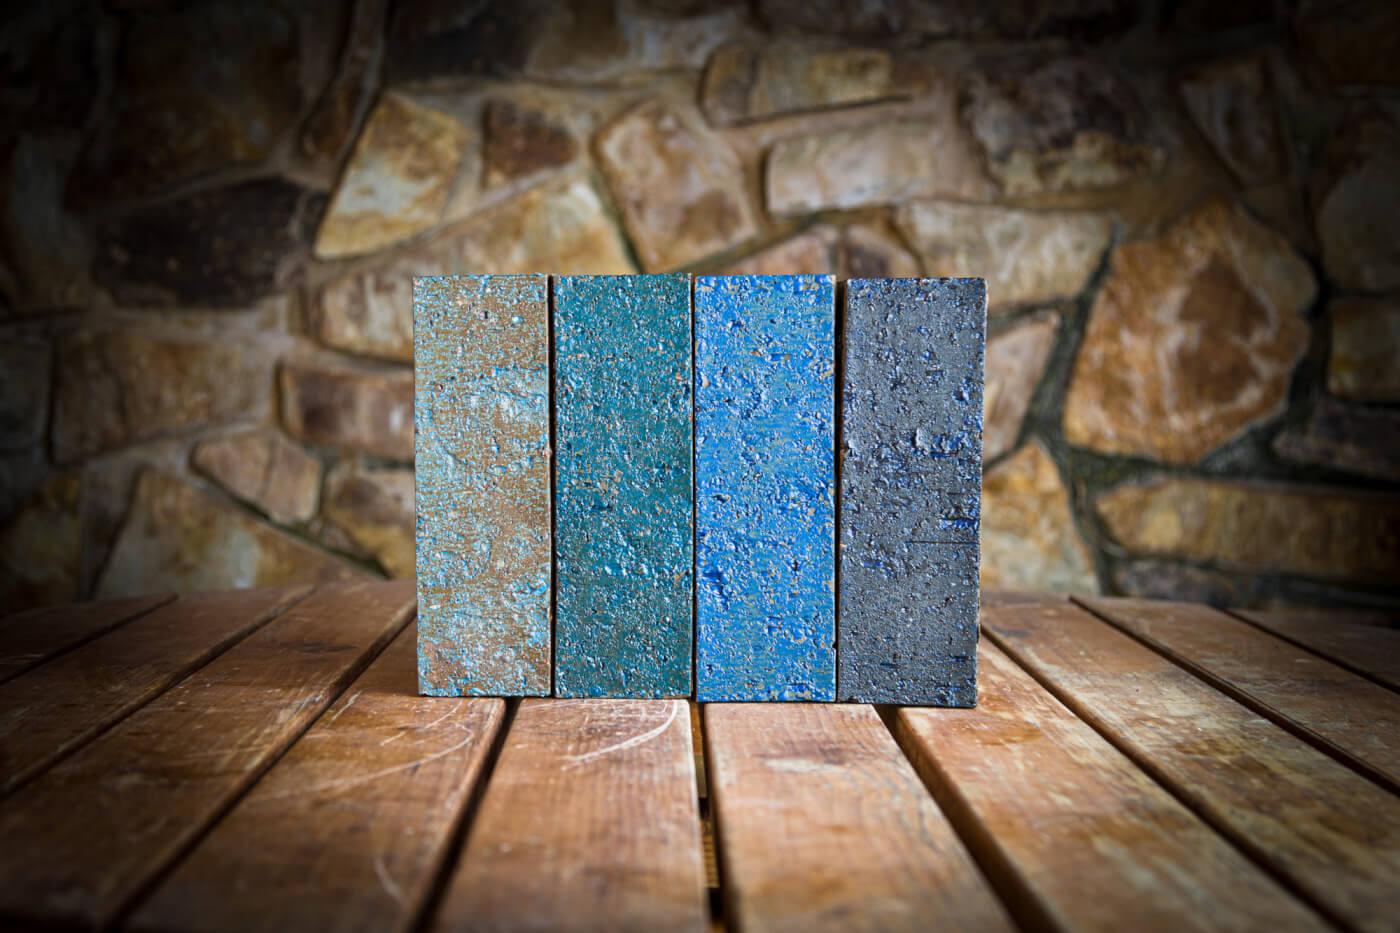 Glazed Bricks Littlehampton Aquarius Blend Rs 17 10